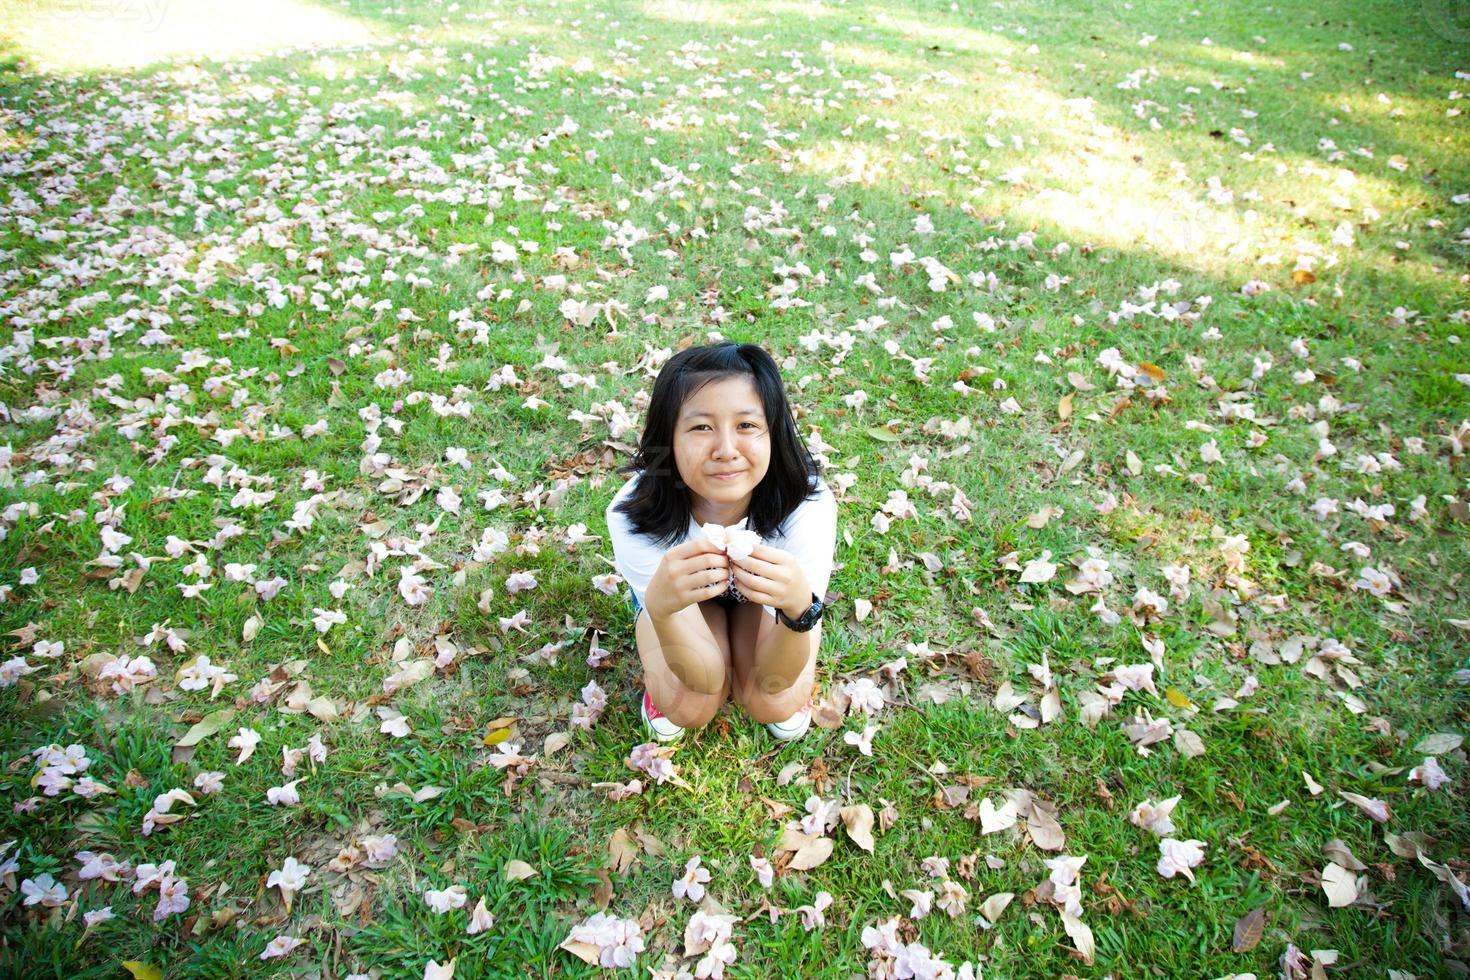 Teenage girl sitting on grass photo